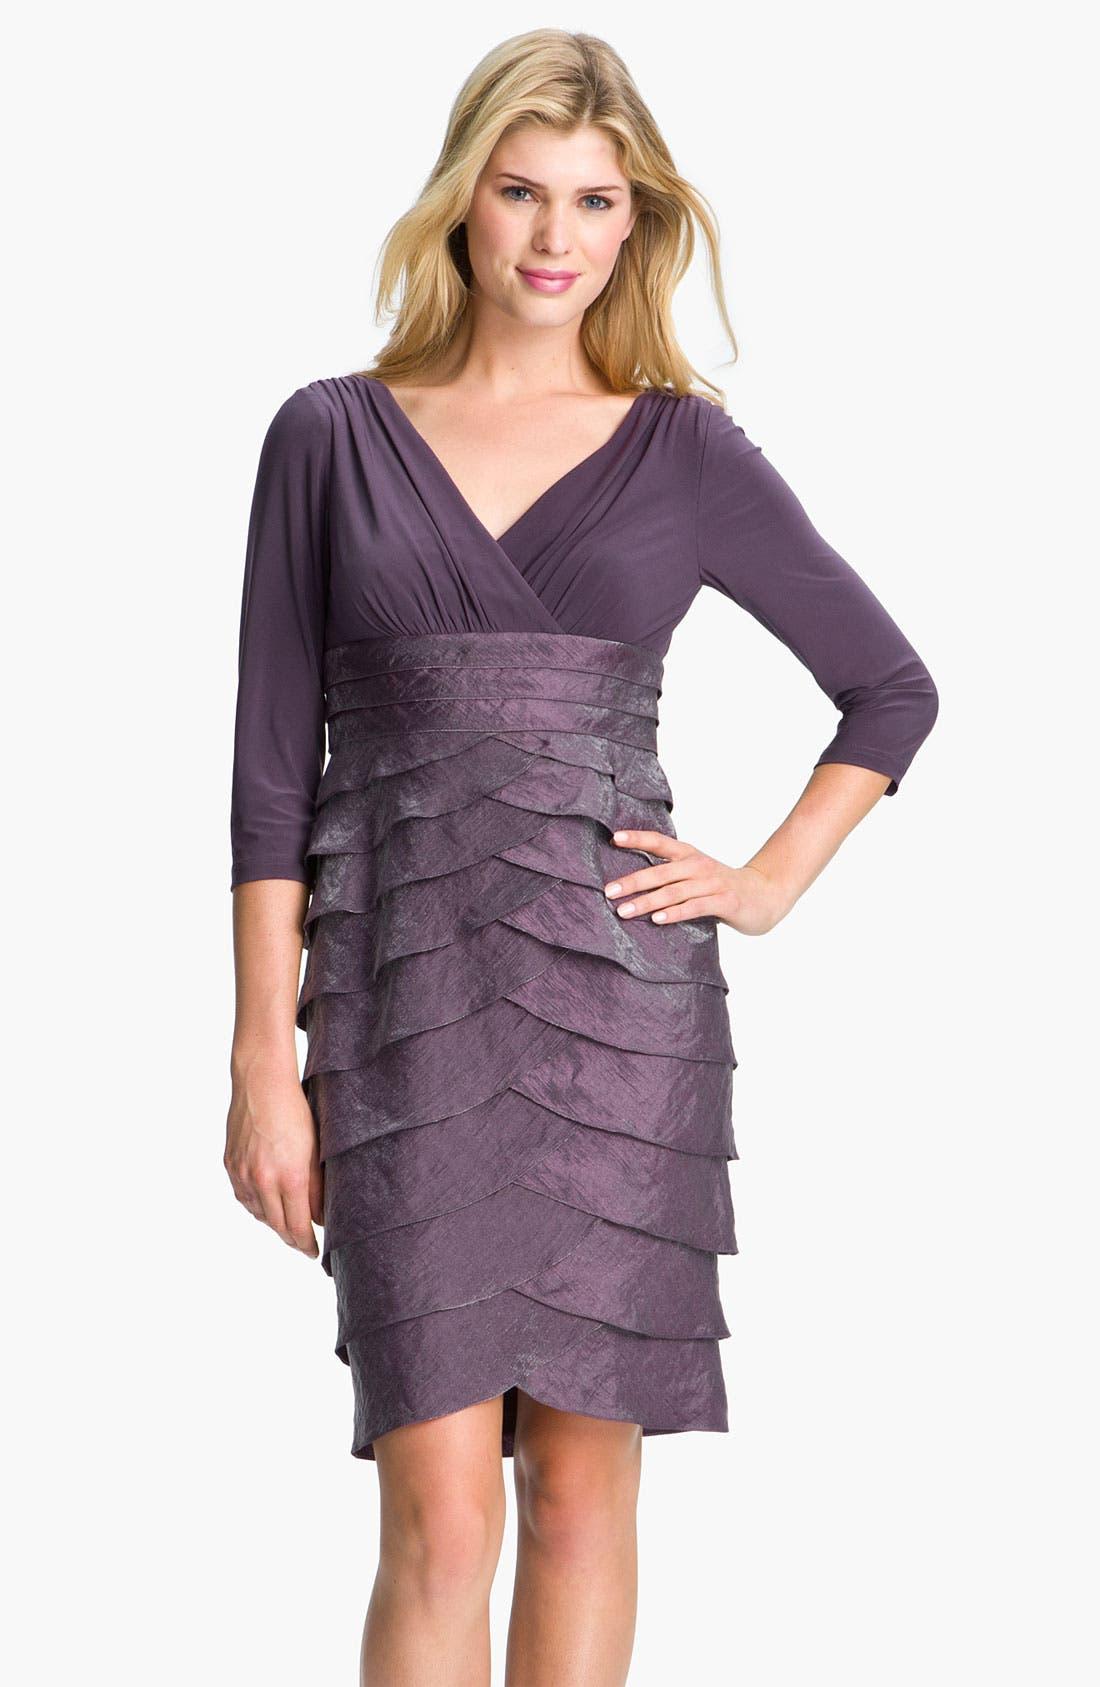 Alternate Image 1 Selected - Adrianna Papell Tiered Surplice Dress (Petite)